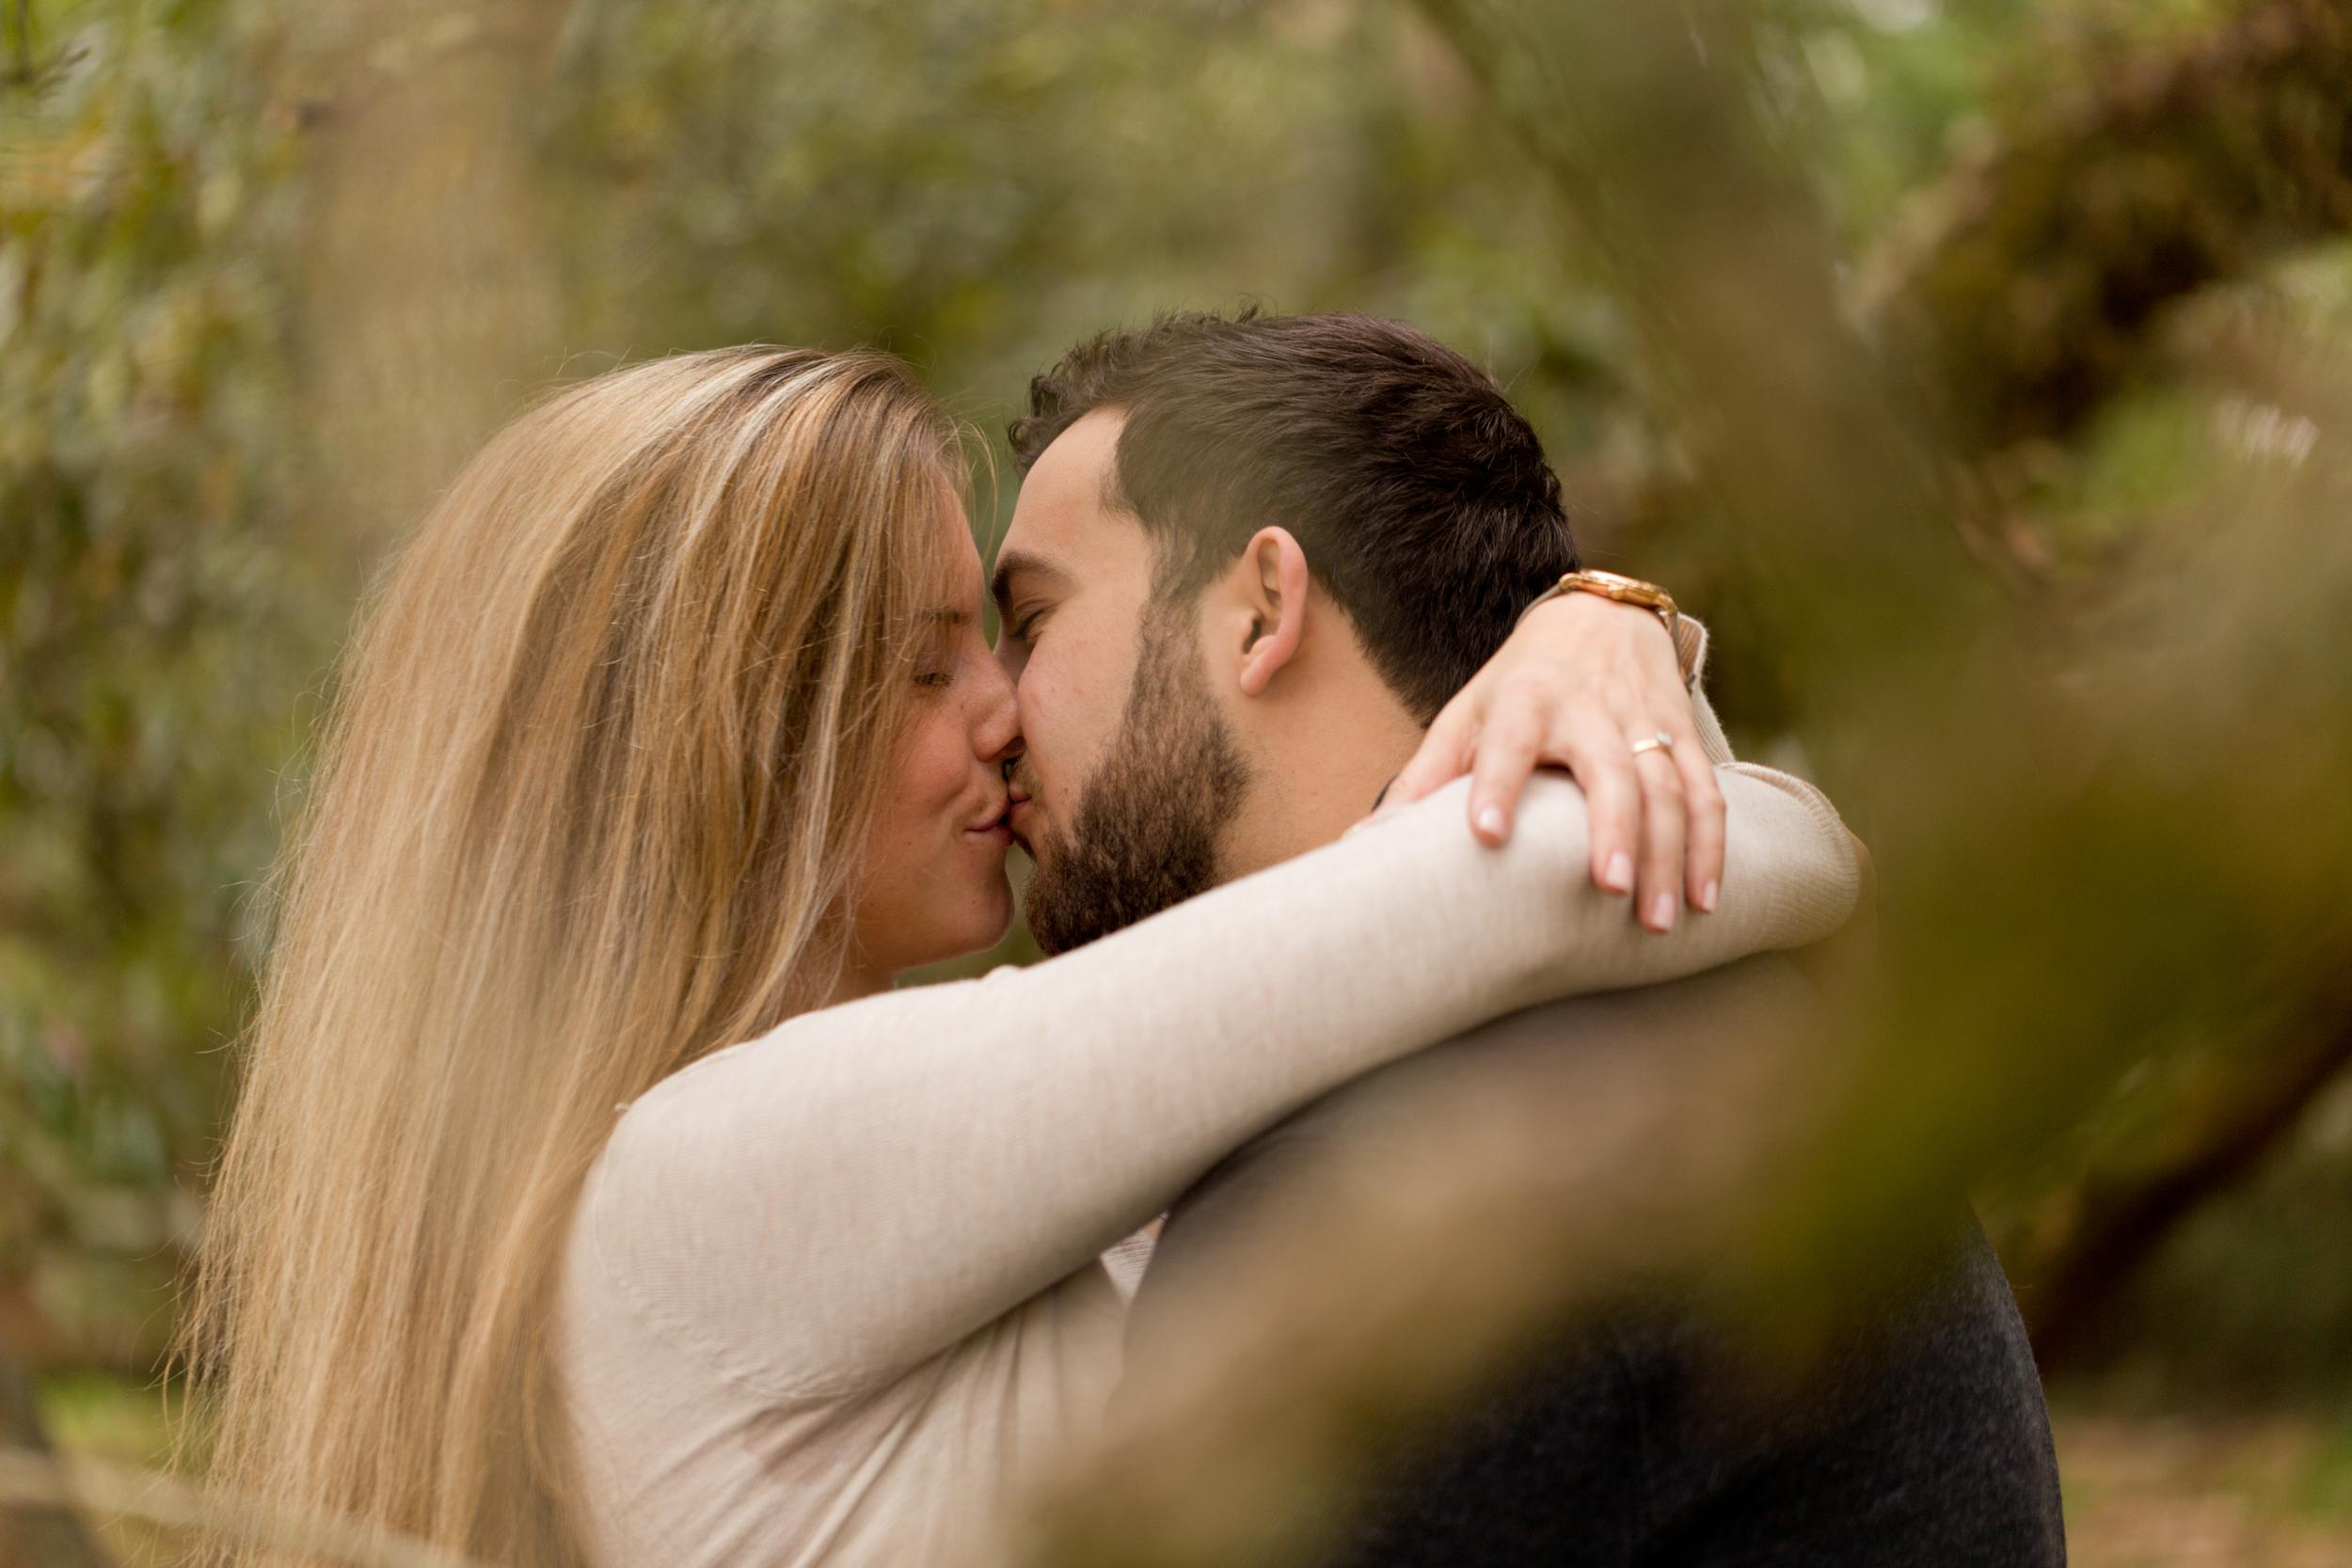 romantic engagement portrait (kissing in the woods)